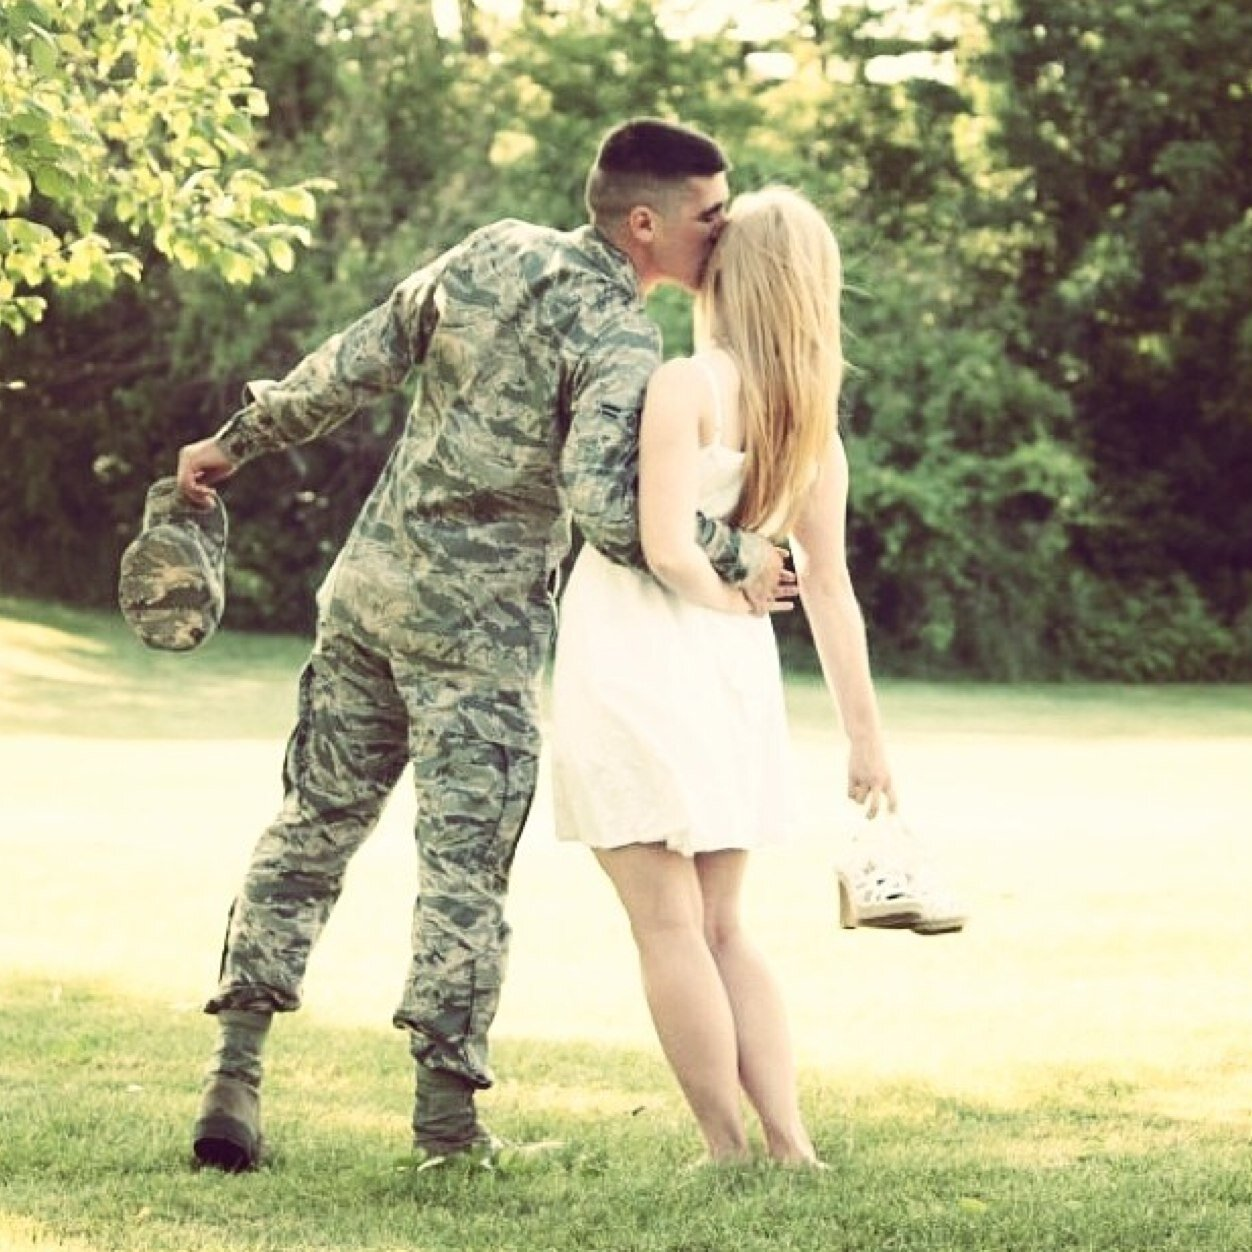 بالصور صور حب وعشق , رموز غزل وحب رومانسي جدا 4476 5